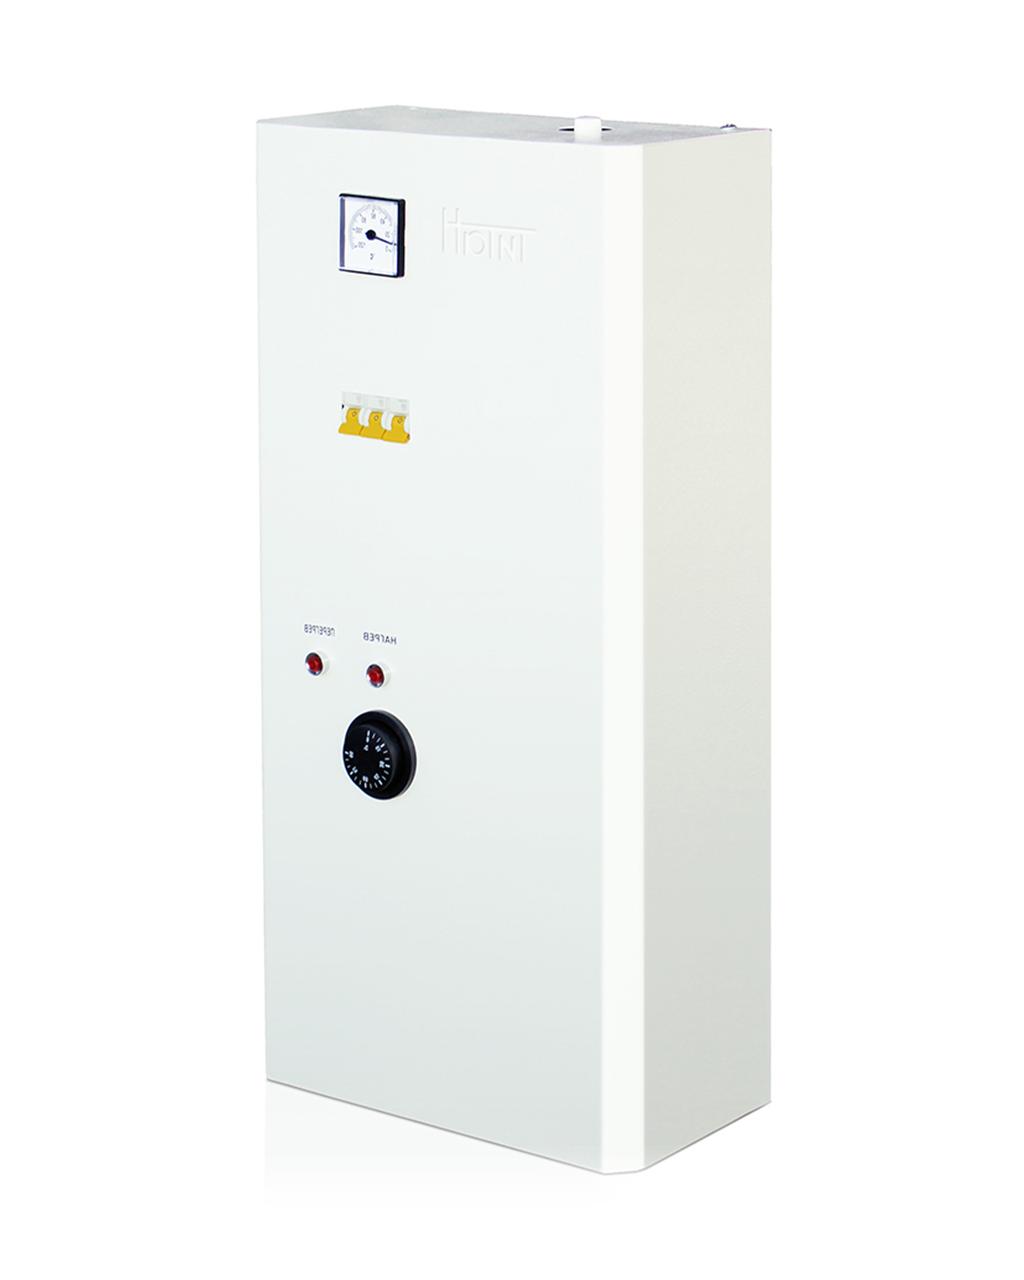 Электрический котел Титан Мини Настенный, 6 кВт 380 В